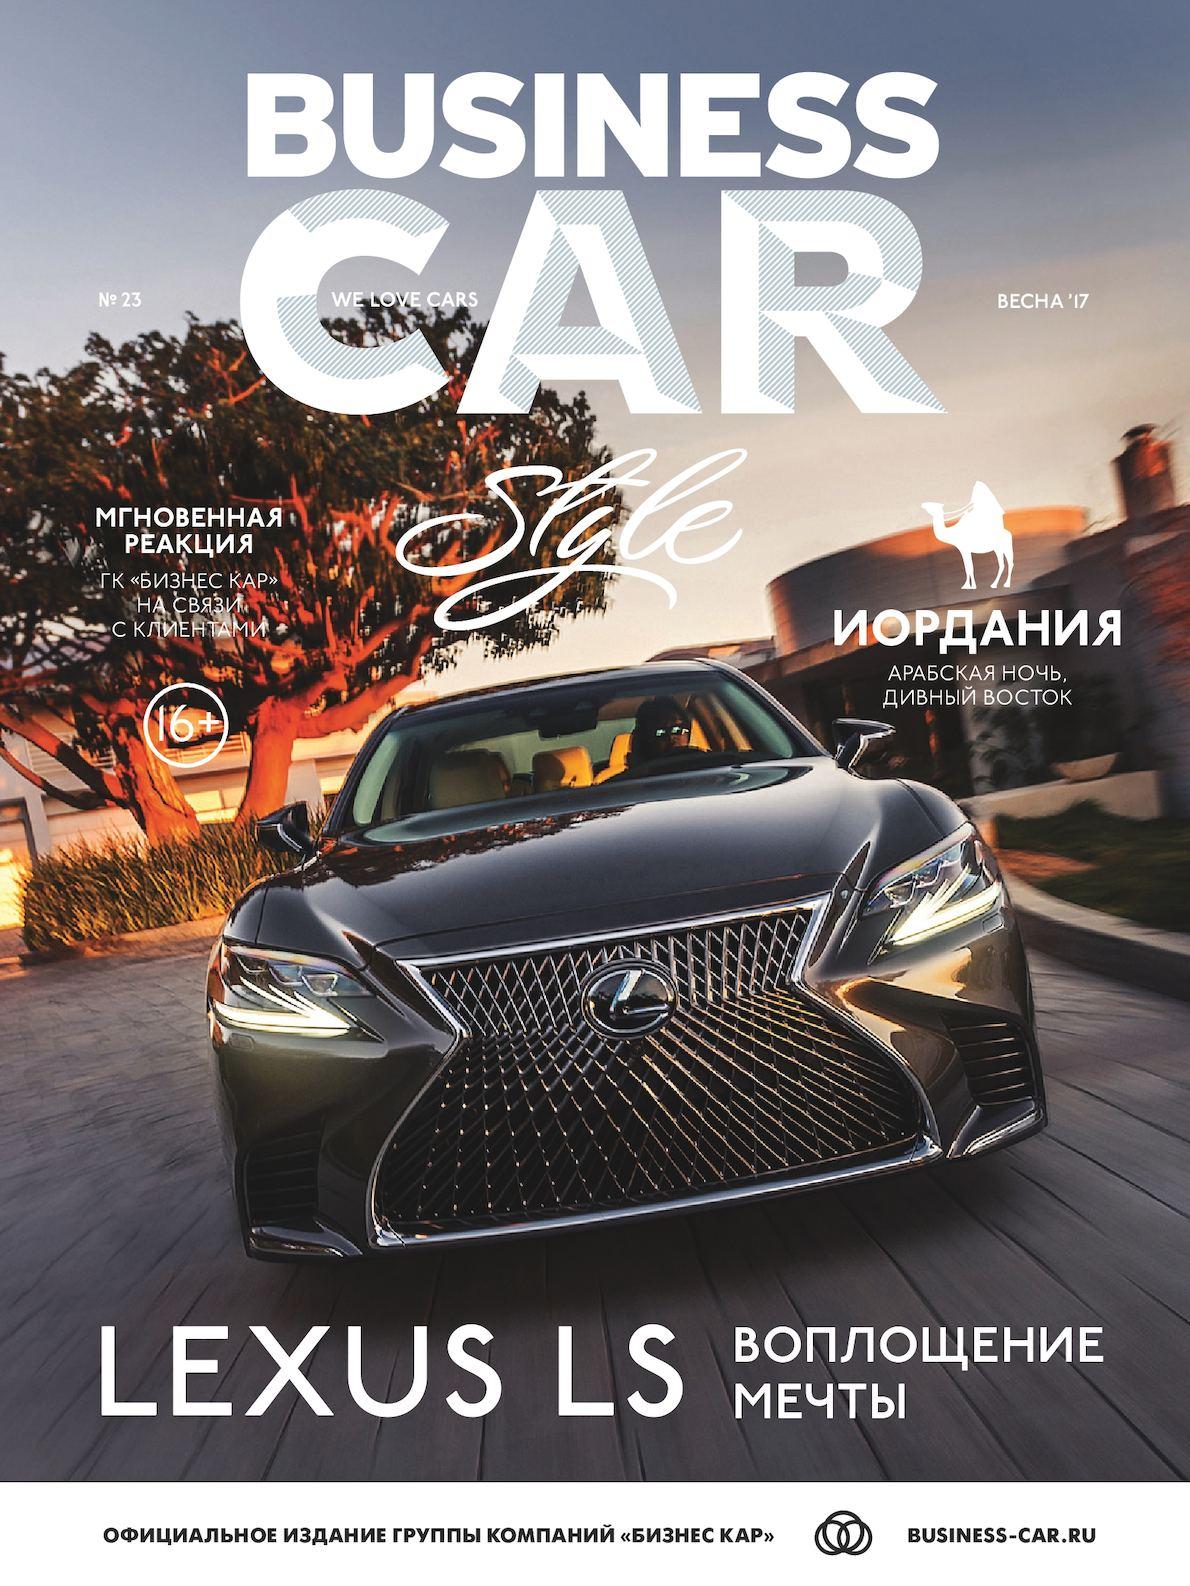 Business car style №23 Lexus